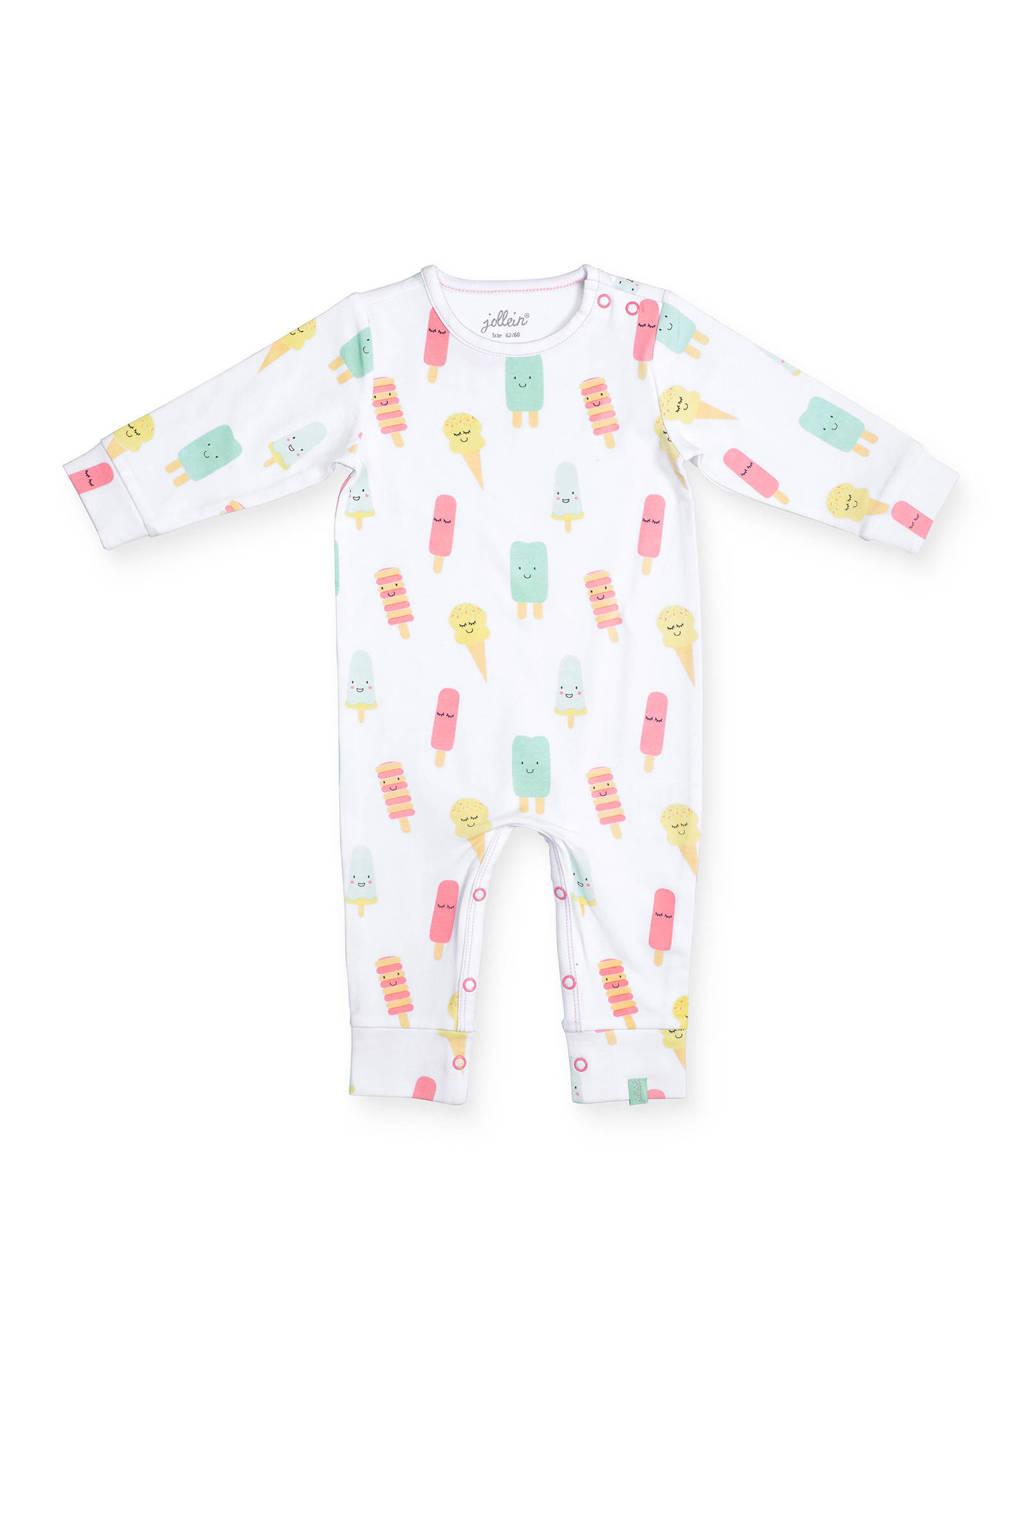 Jollein newborn baby boxpak, wit/roze/mint